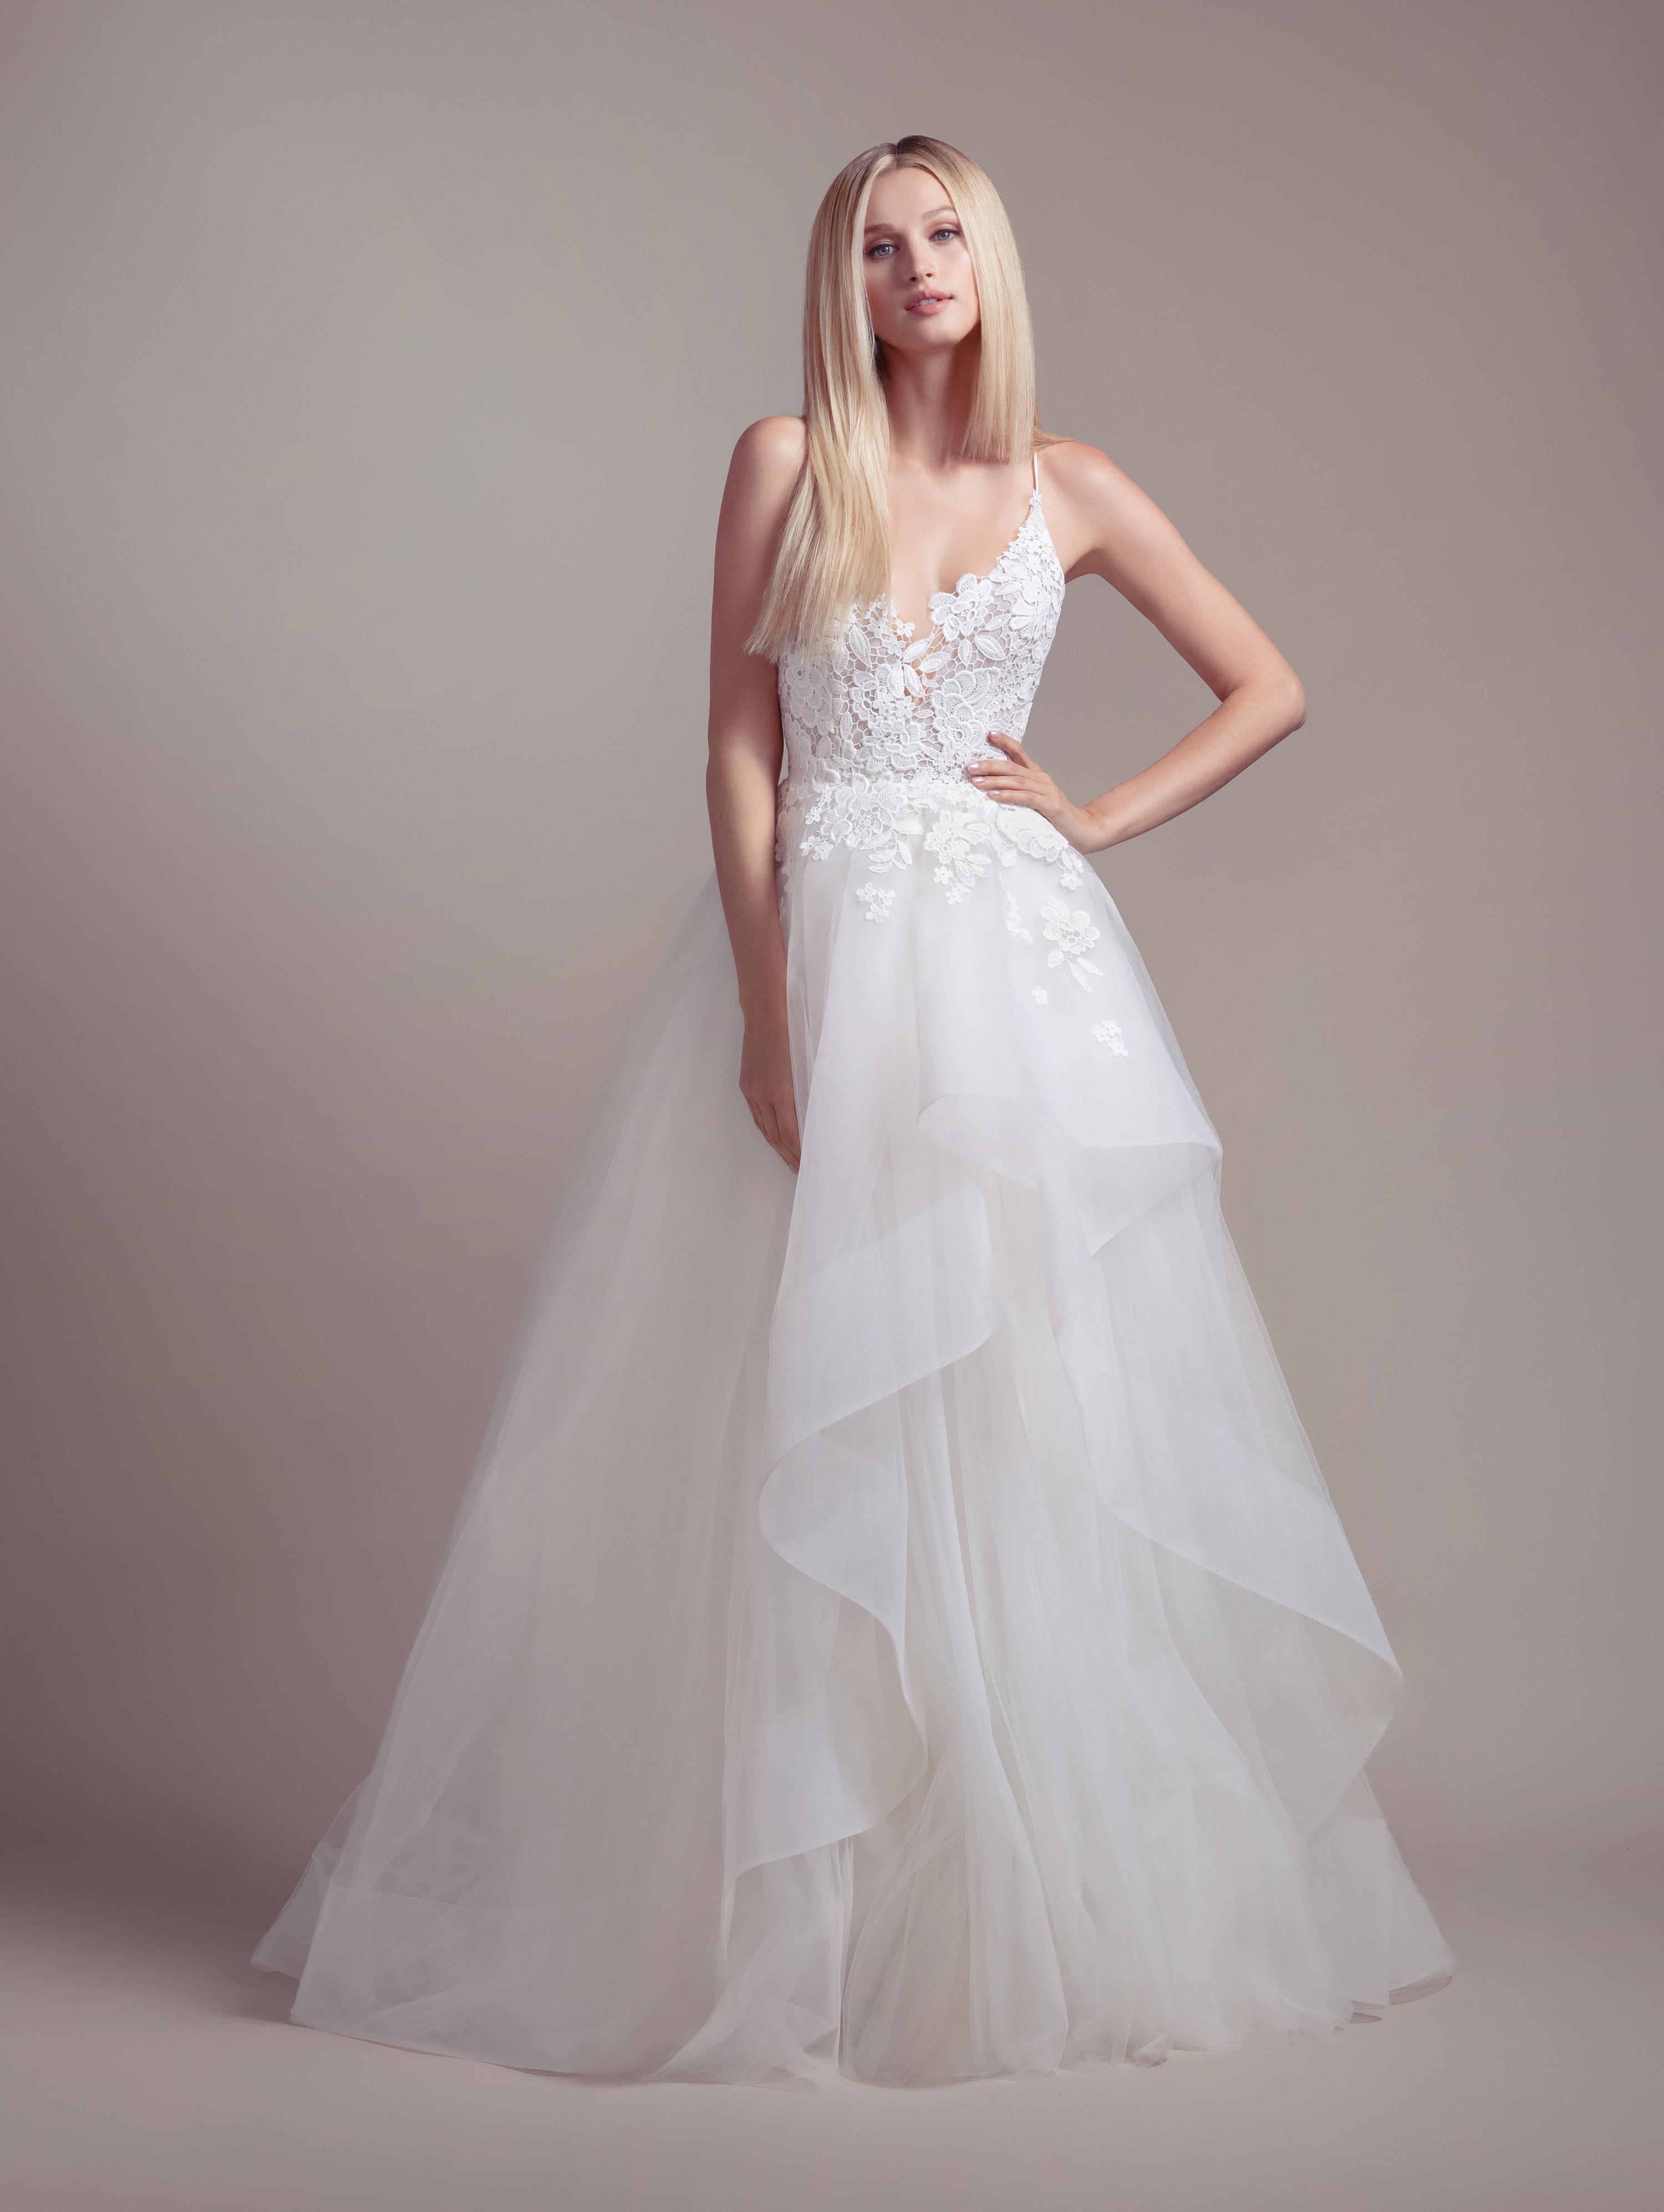 b693a1f6046e Lace Bodice Spaghetti Strap Ball Gown Wedding Dress   Kleinfeld Bridal